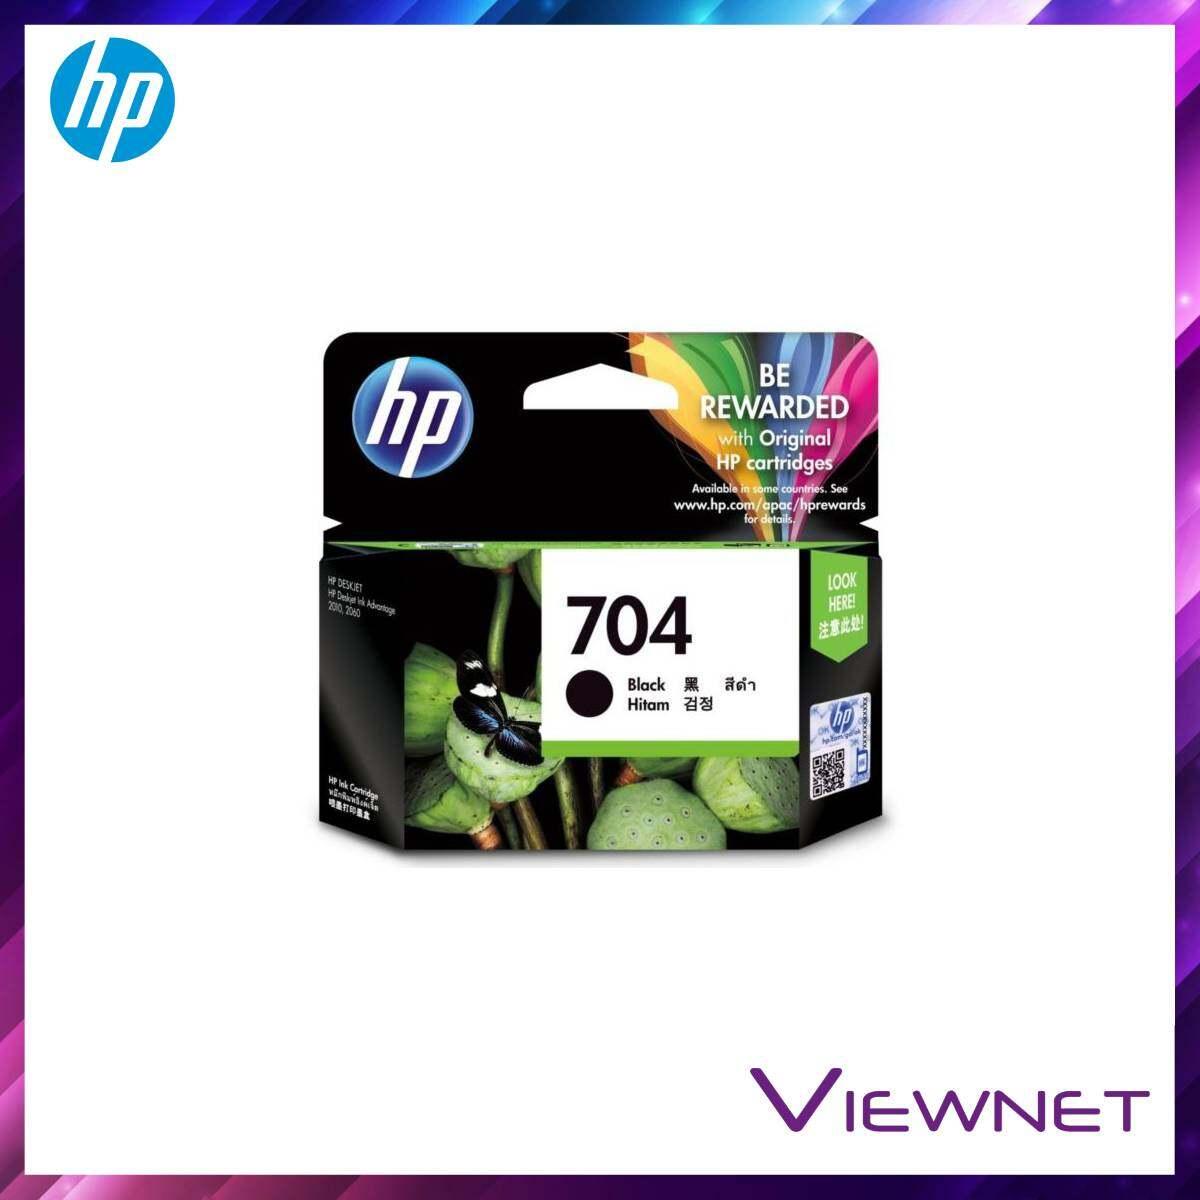 HP 704 Original Ink Advantage Cartridge (CN693AA/704) Black / Tri-Colour / Combo Pack (Black / Tri-colour)